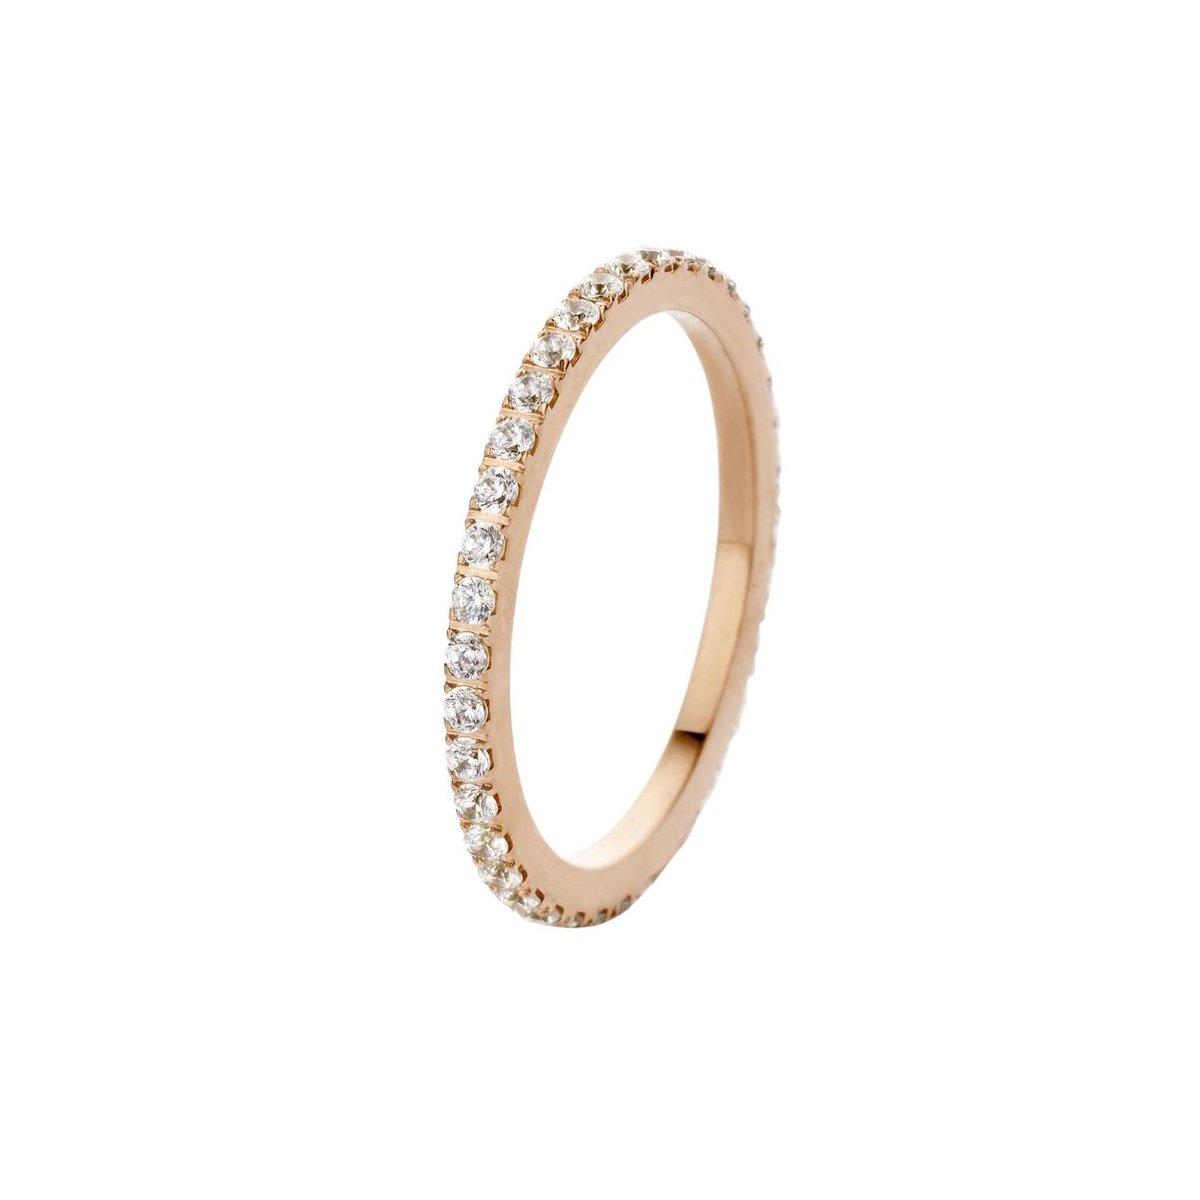 Melano friends Sade cz ring - Roségoudkleurig + Crystal - Dames - Maat 58 - Melano Jewelry